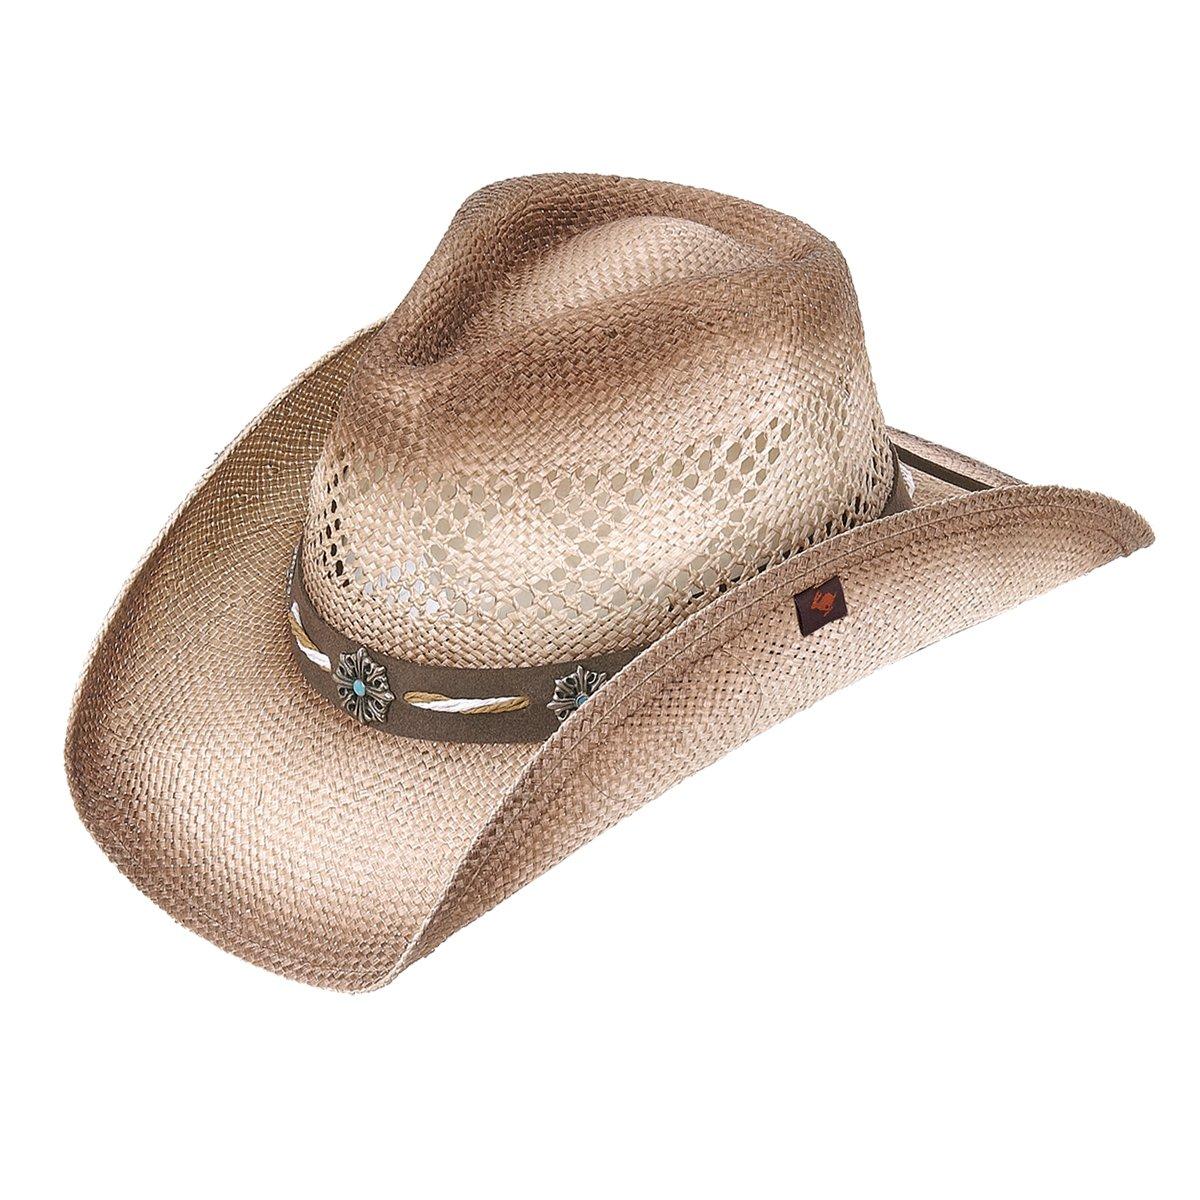 8a0c6ed0cac Peter grimm shaggy drifter hat clothing jpg 1200x1200 Grimm cowboy hats